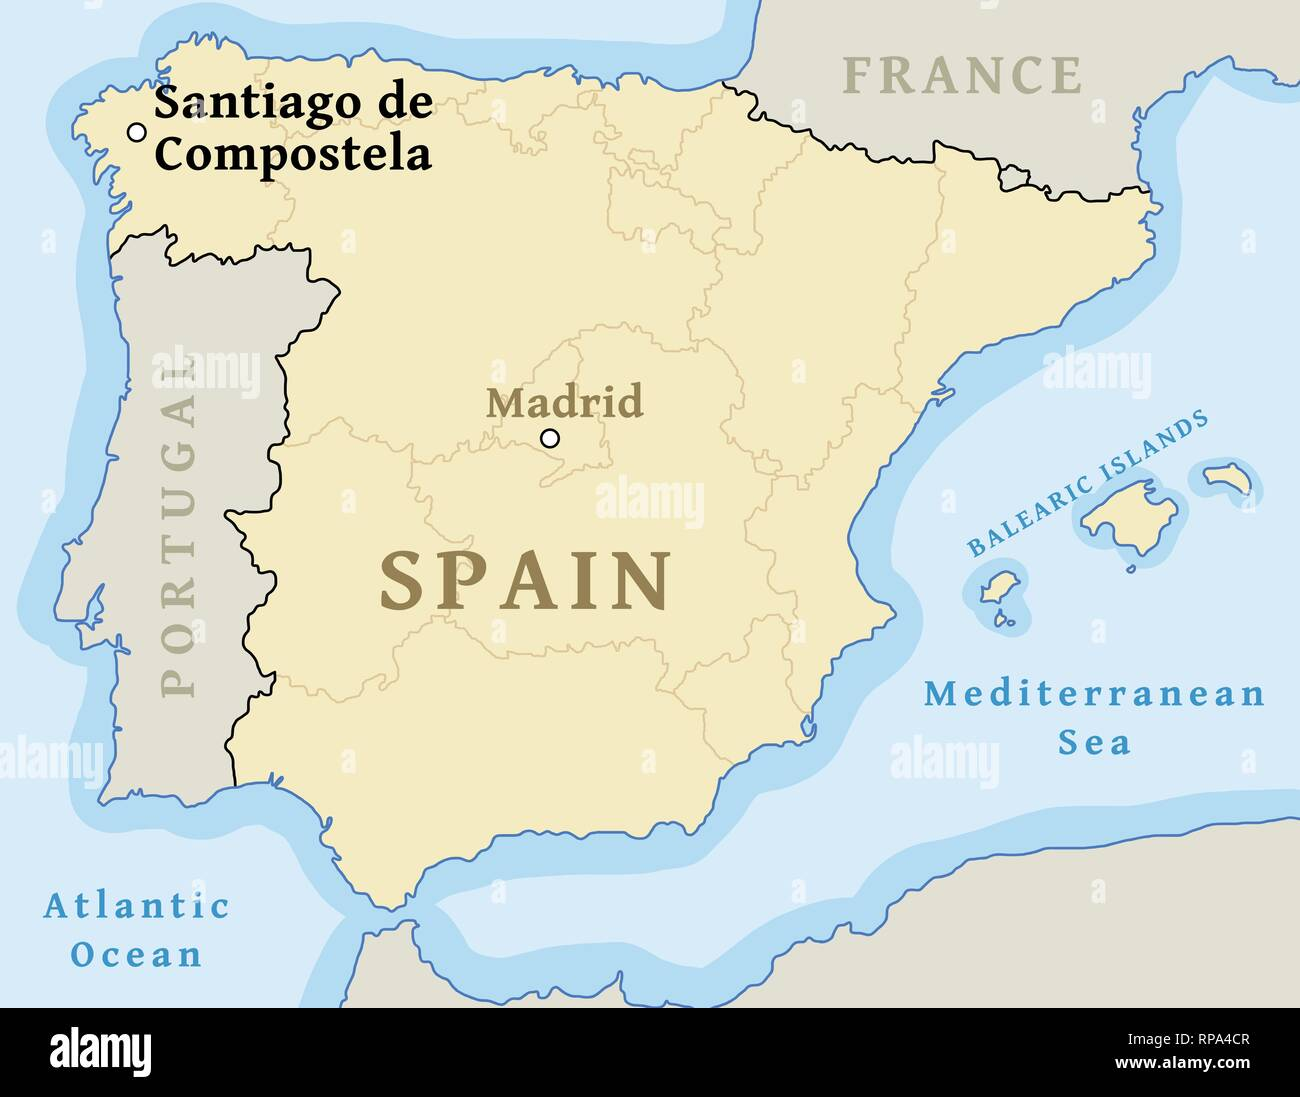 Santiago De Compostela Map Location Locate City On Map Of Spain